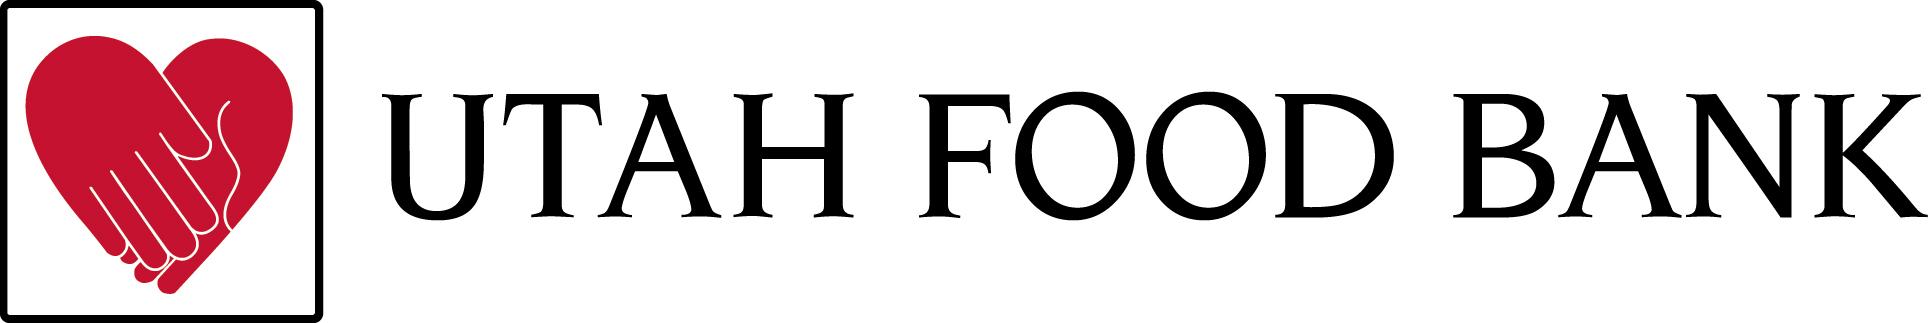 Utah Food Bank Company Logo